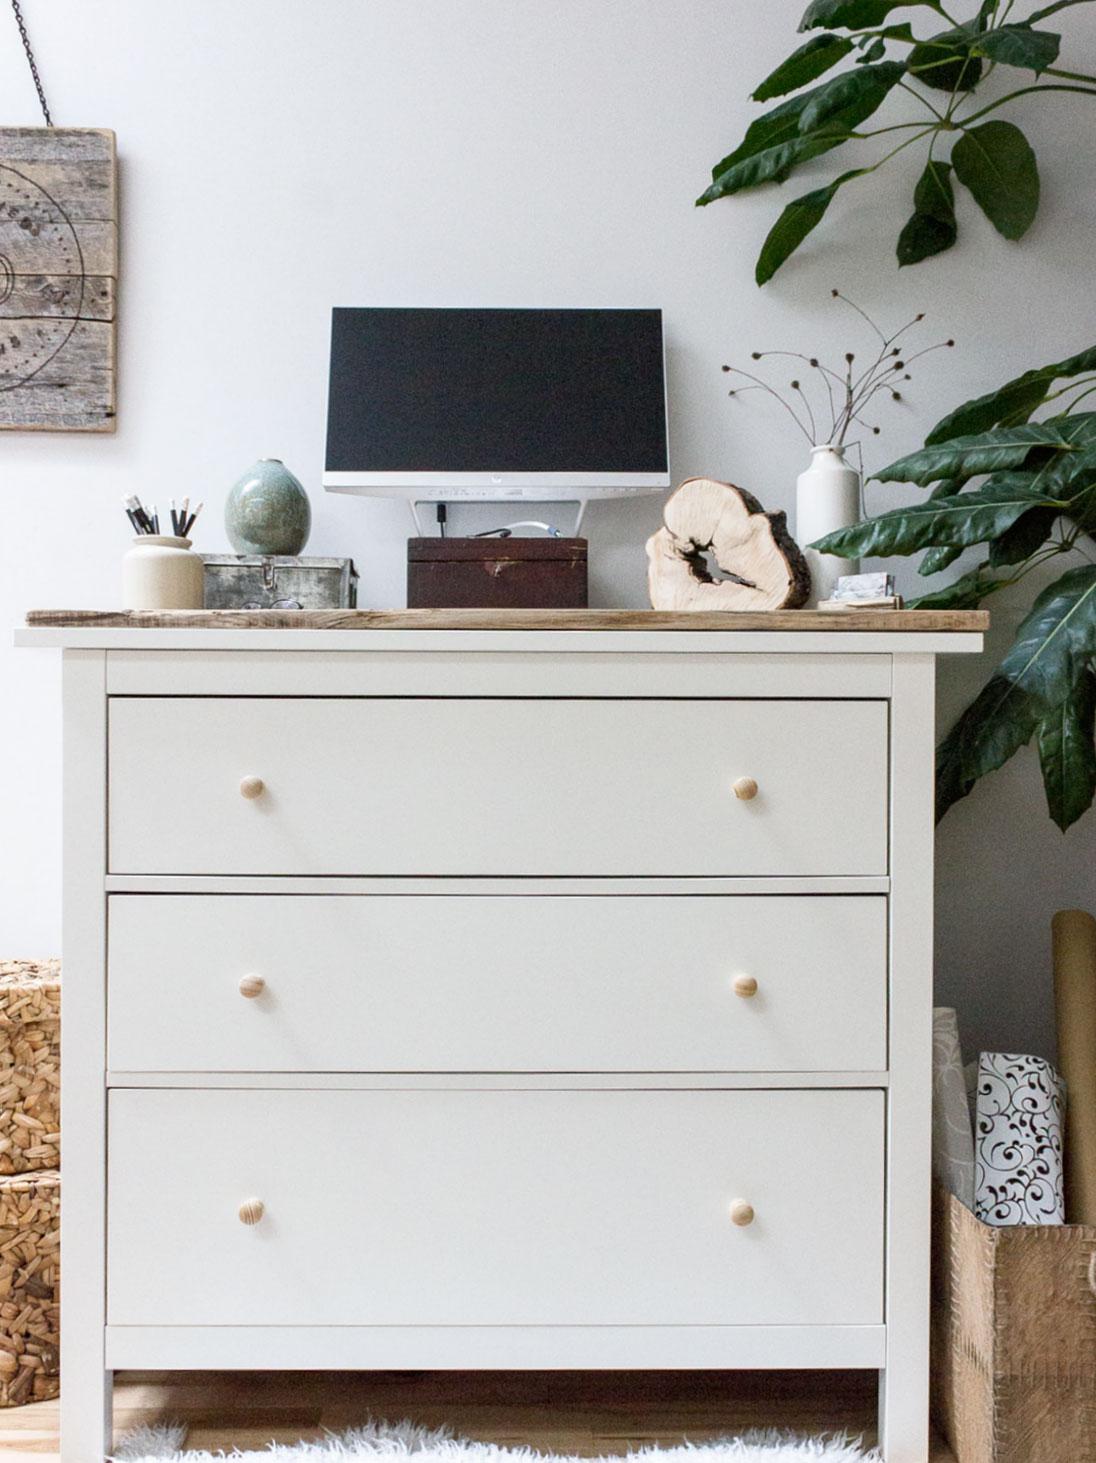 DIY一张站立式办公桌